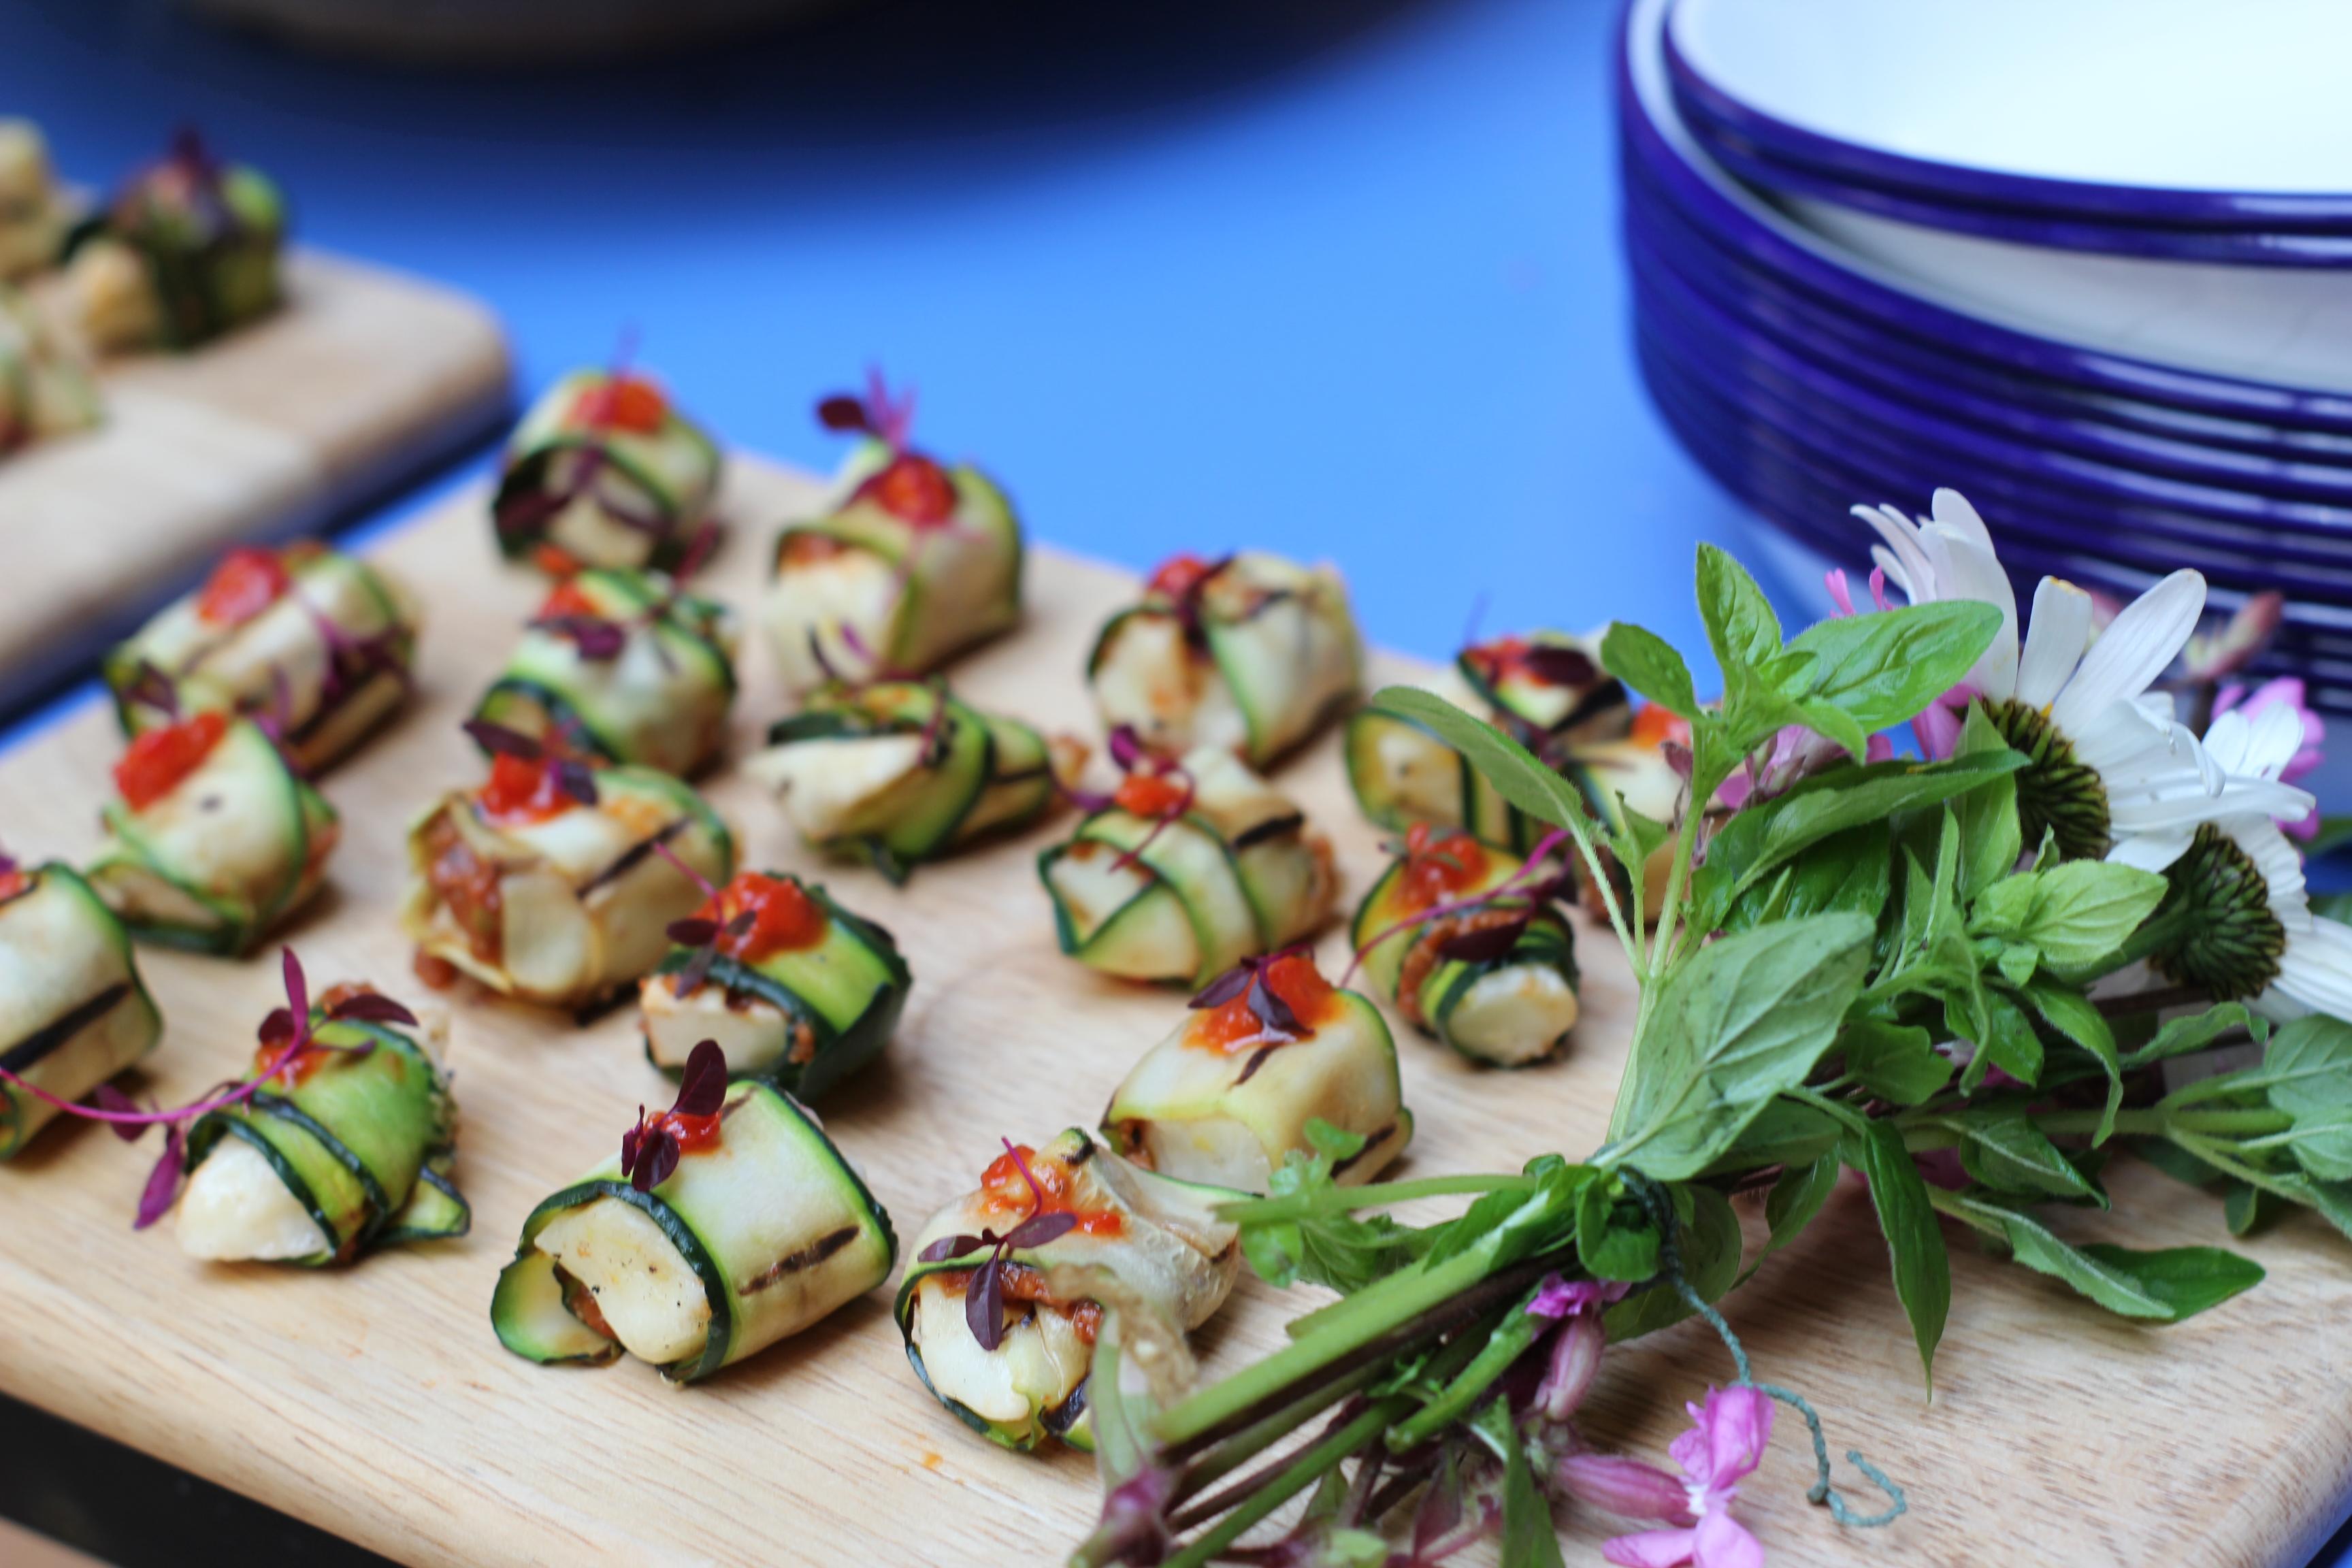 Vegan wedding food platter on wooden board